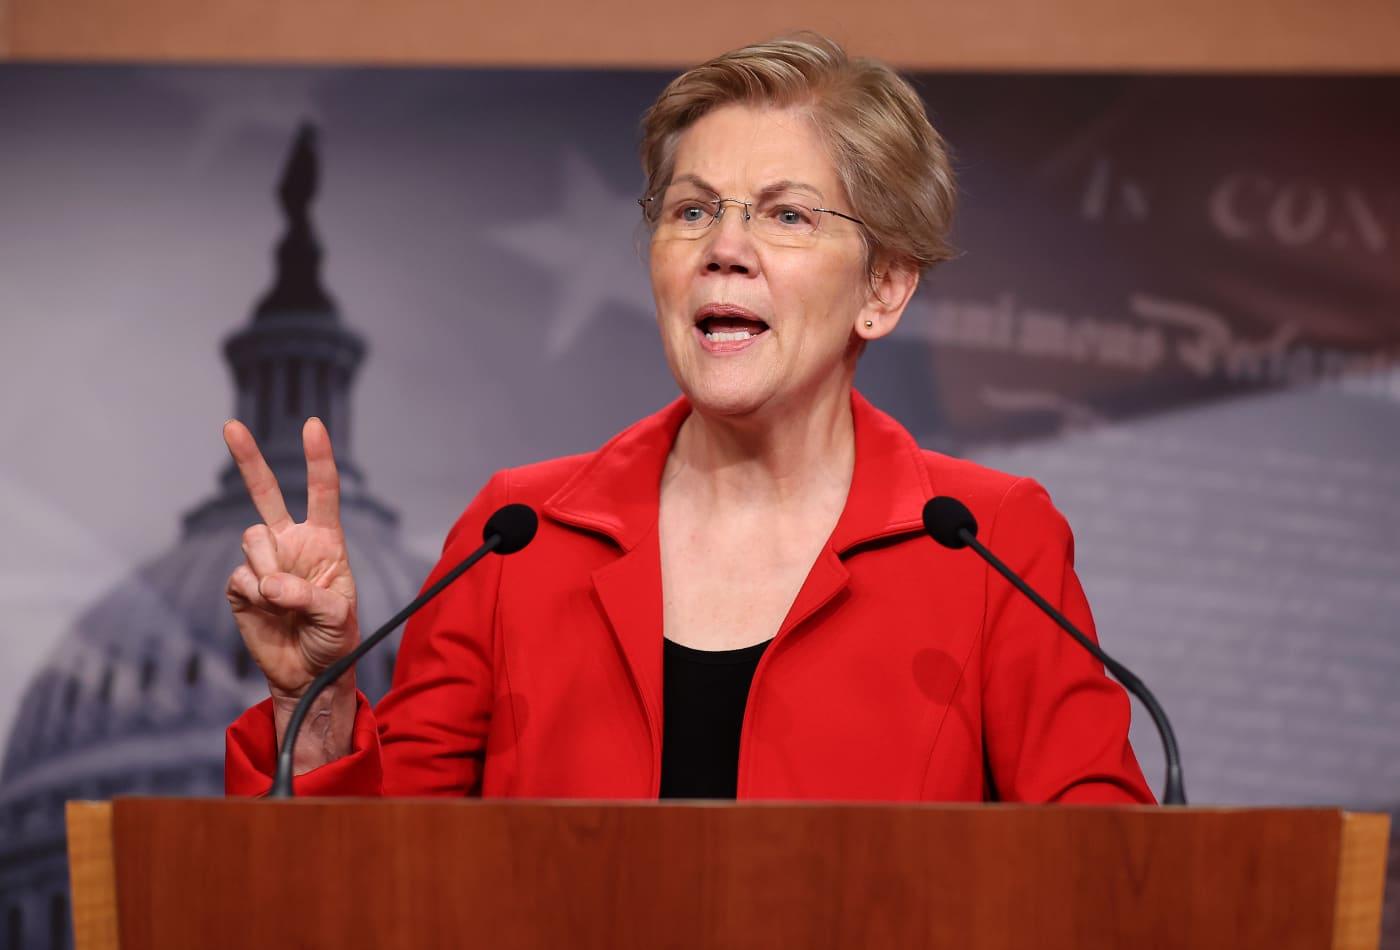 21 Senate Dems urge Biden to put recurring stimulus checks, unemployment in recovery plan